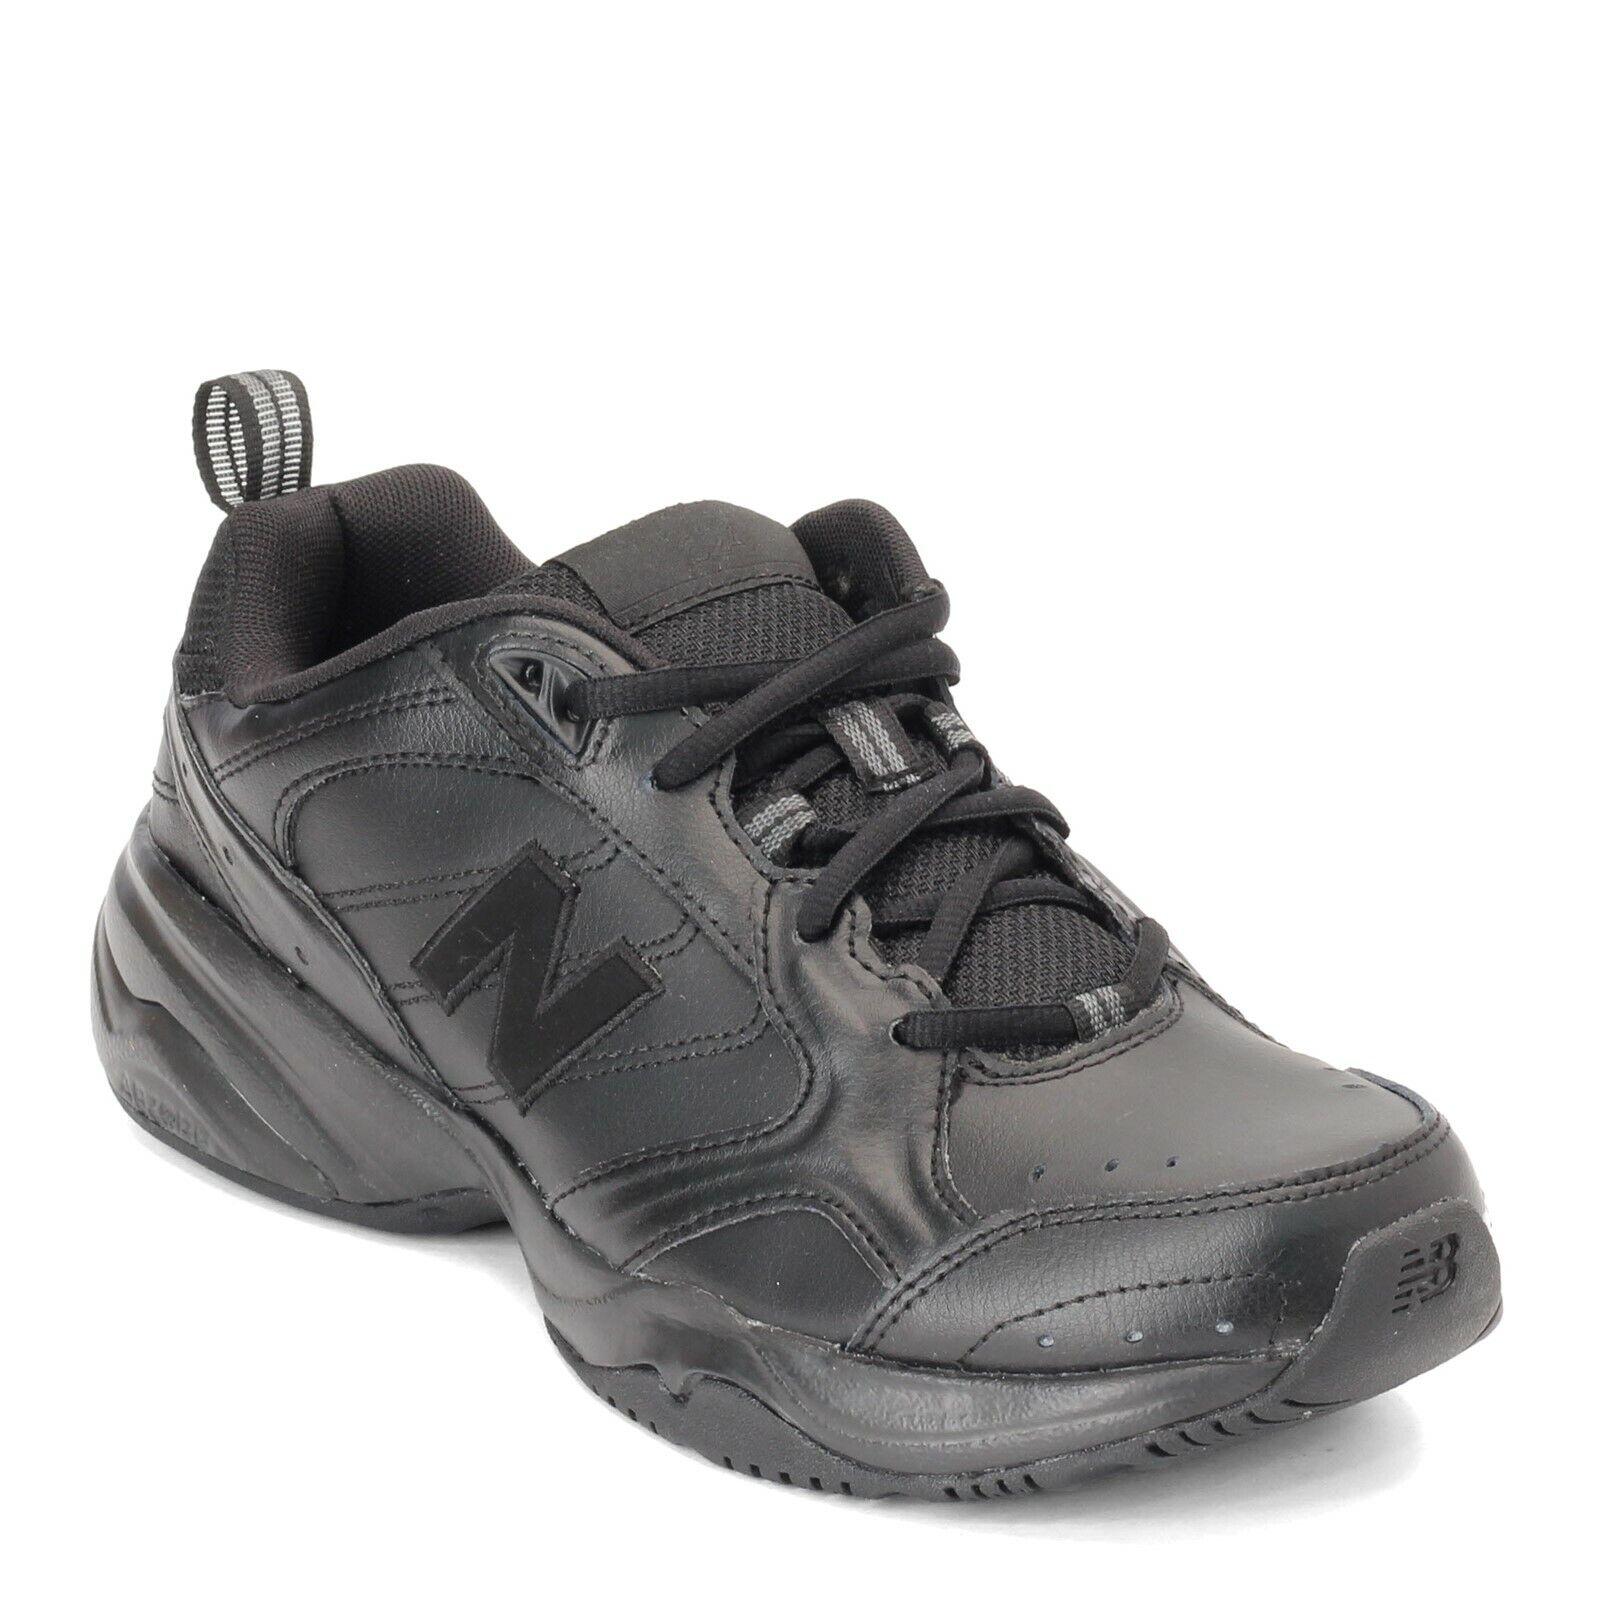 Men's New Balance, 624 Training Shoe